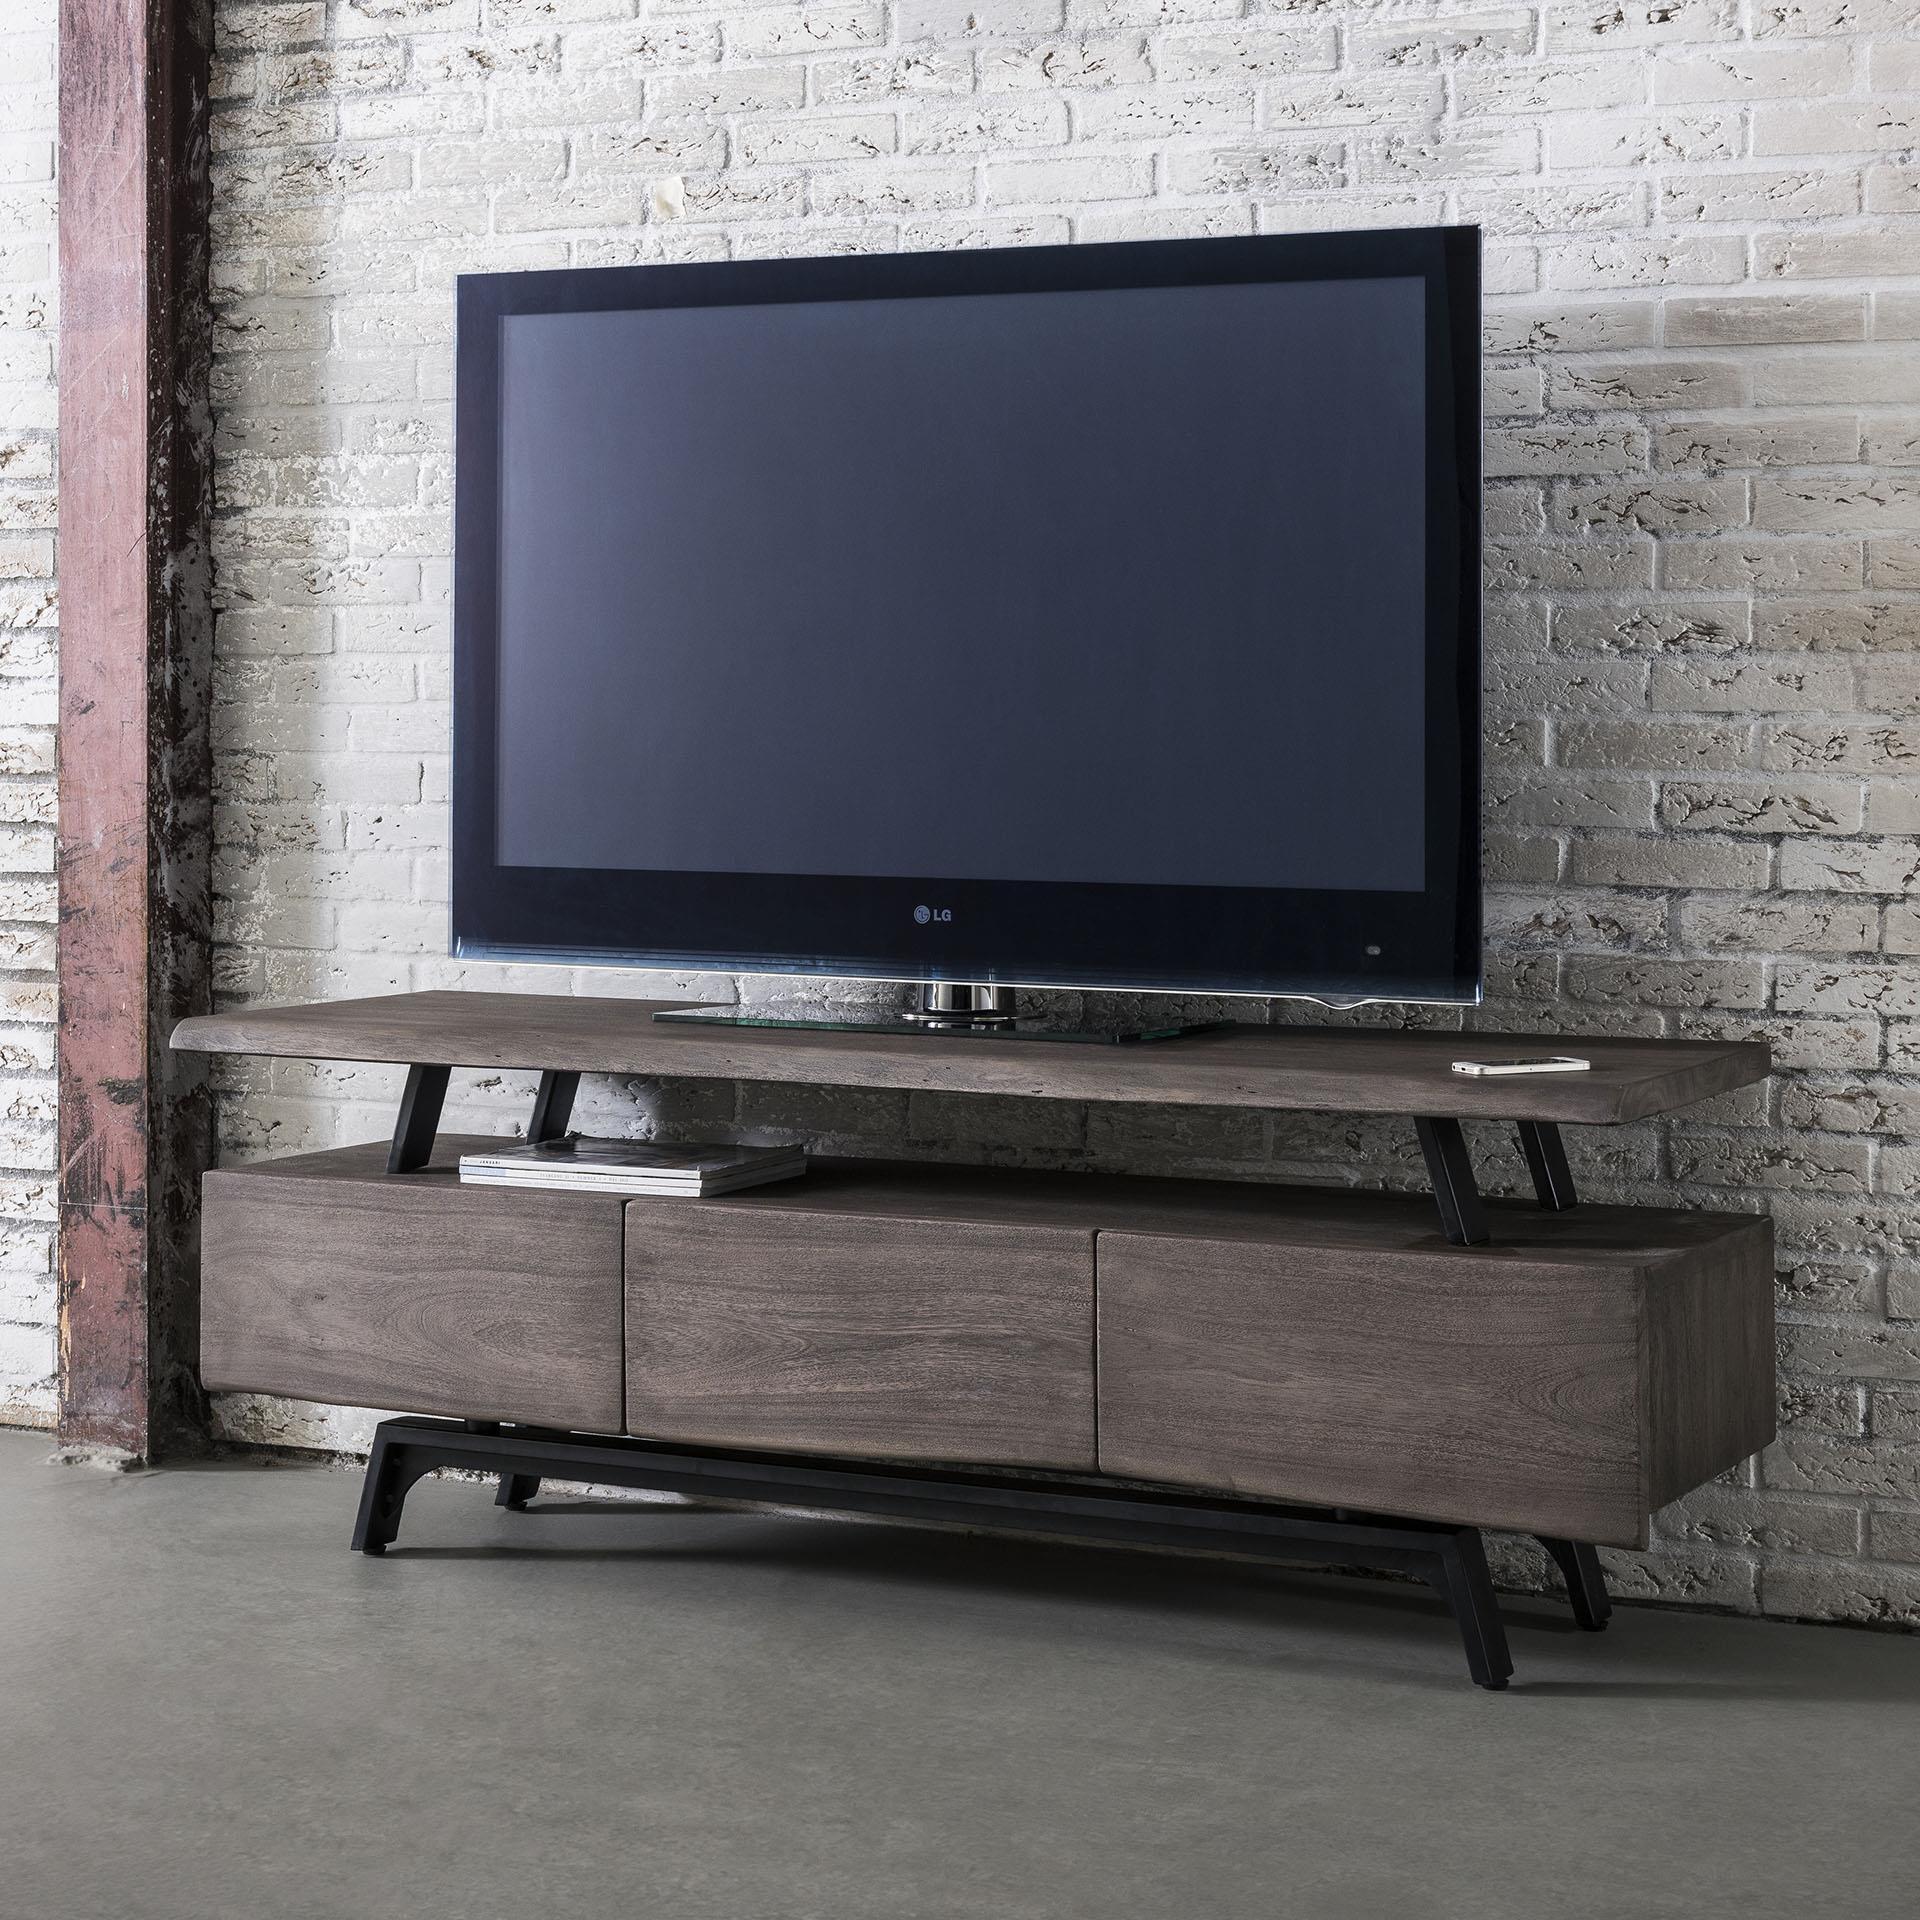 Tv Meubel Bovenkast.Tv Meubel Stam 165cm Kleur Leem Kasten Tv Meubels Interieur